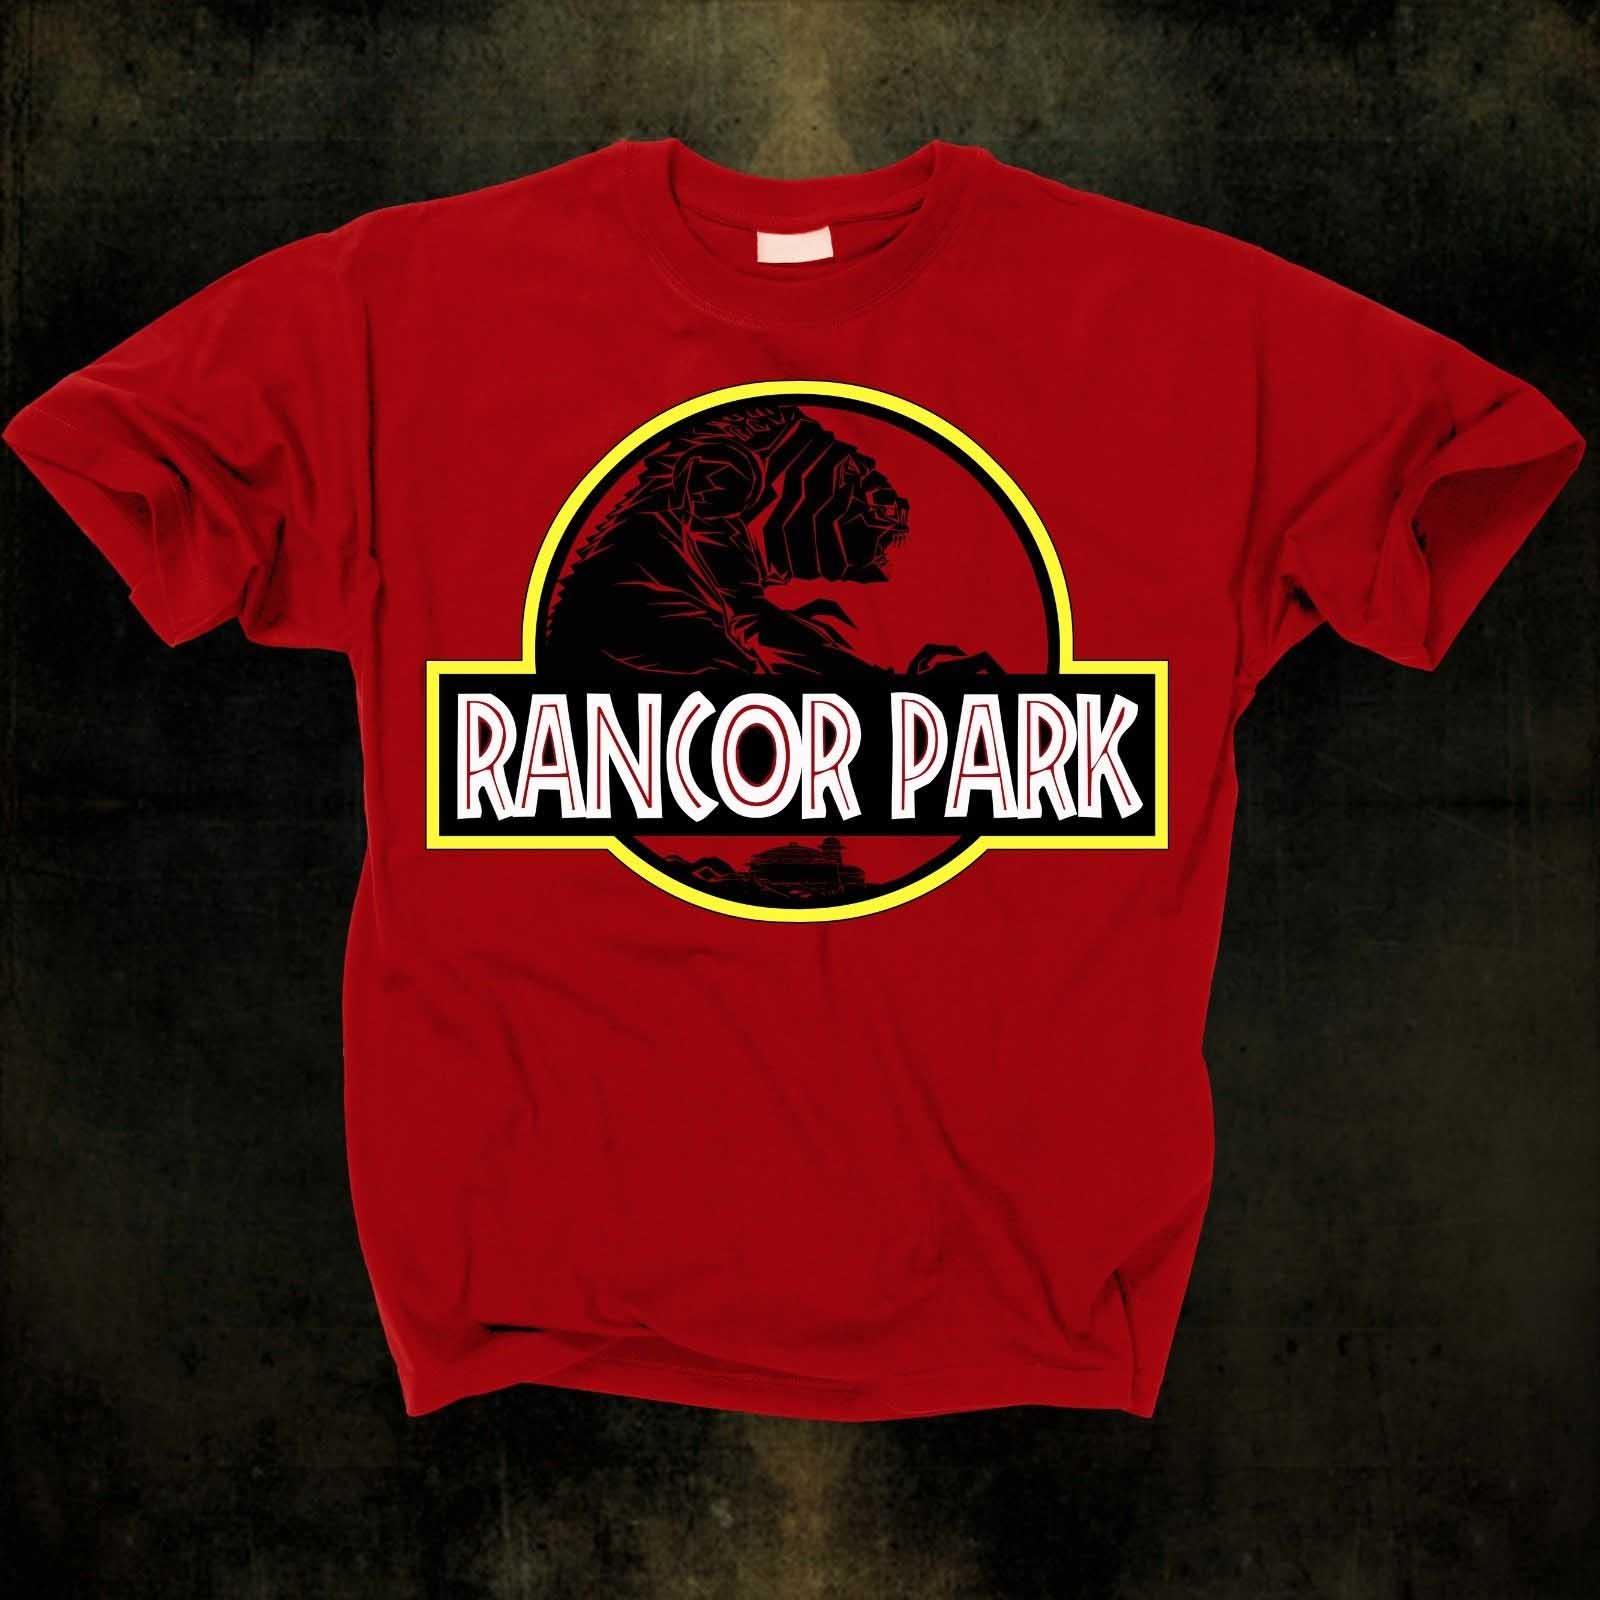 b8483bef Star Wars- Rancor Park on a red shirt (Star Wars & Jurassic Park ...